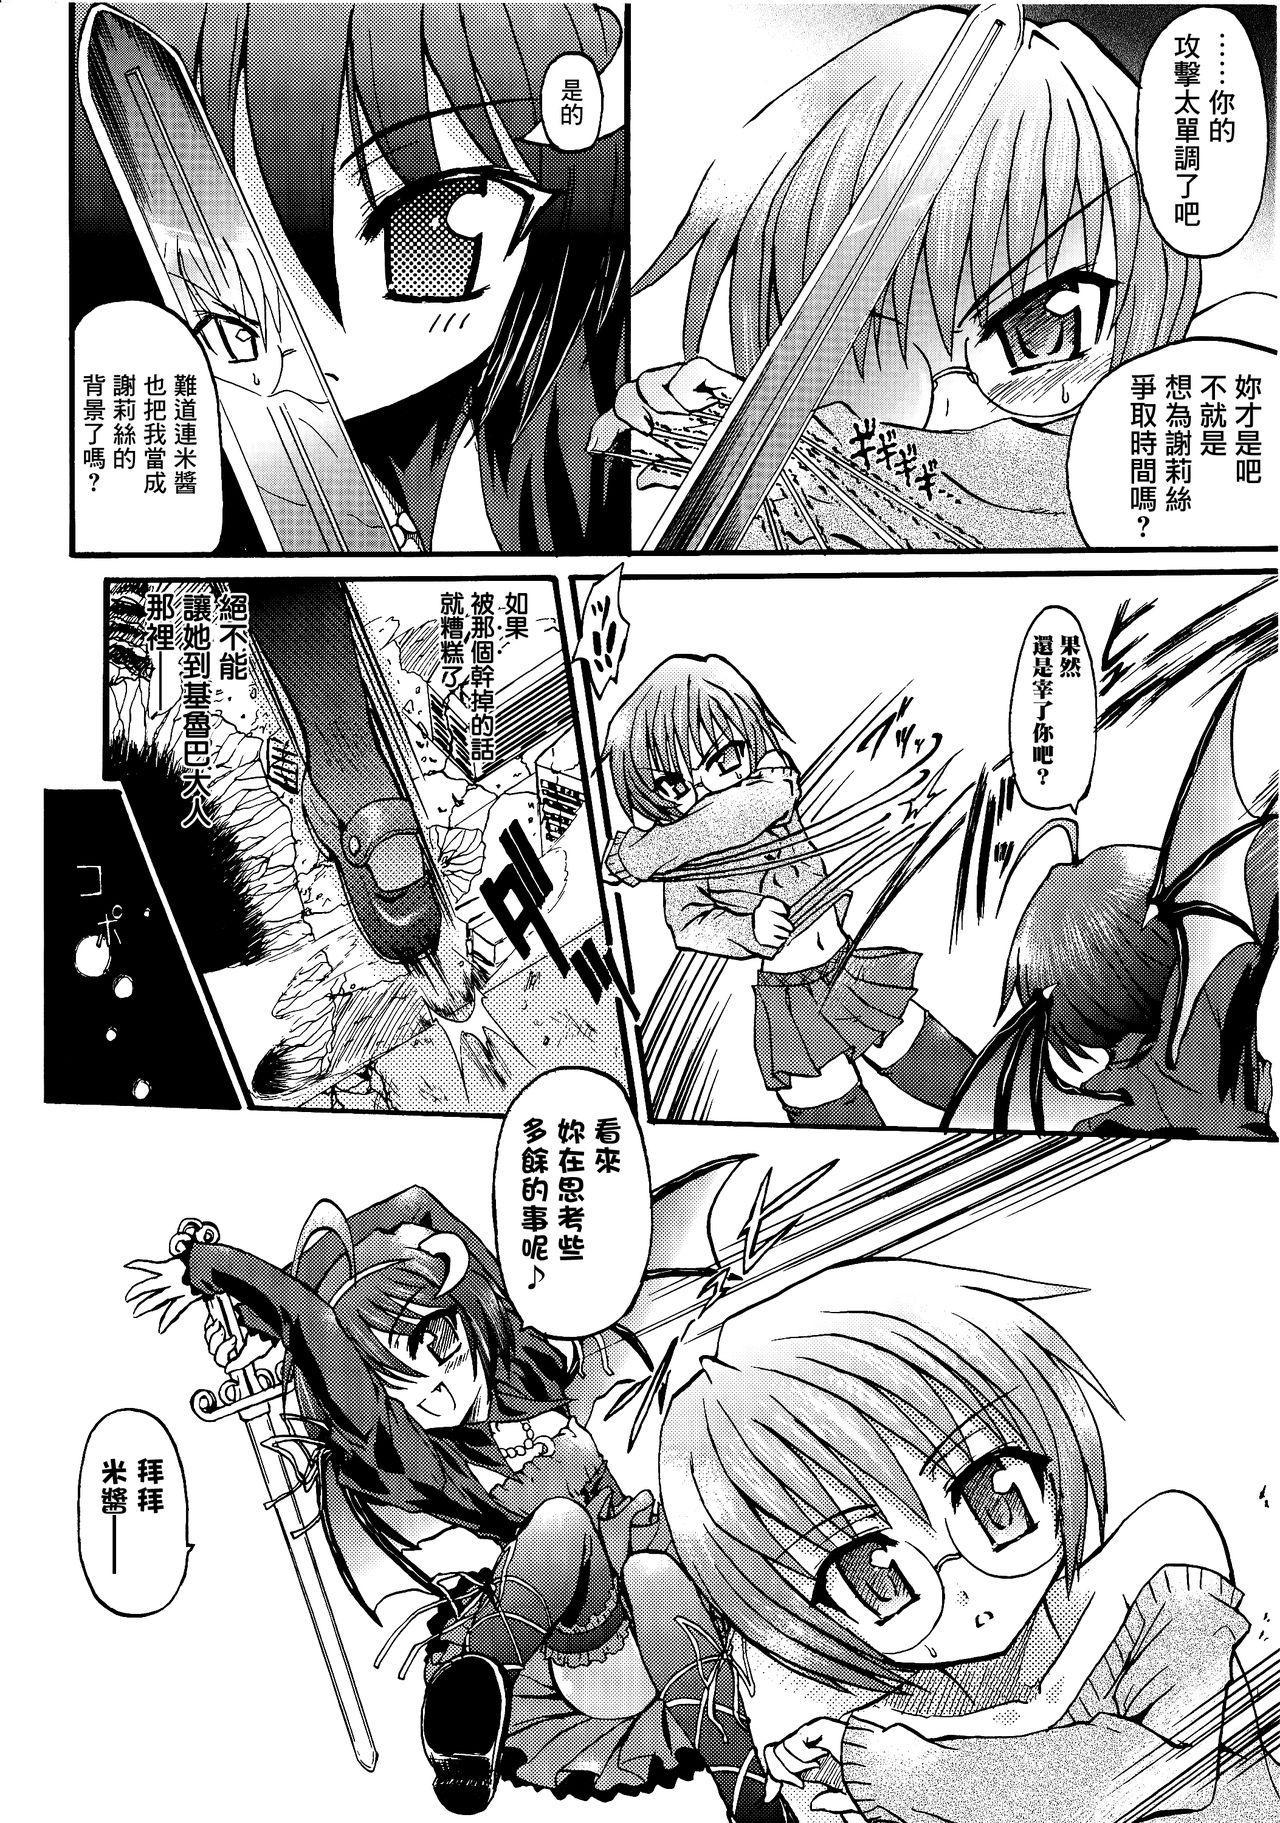 Ma ga Ochiru Yoru Demonic Imitator CH.1-7 14